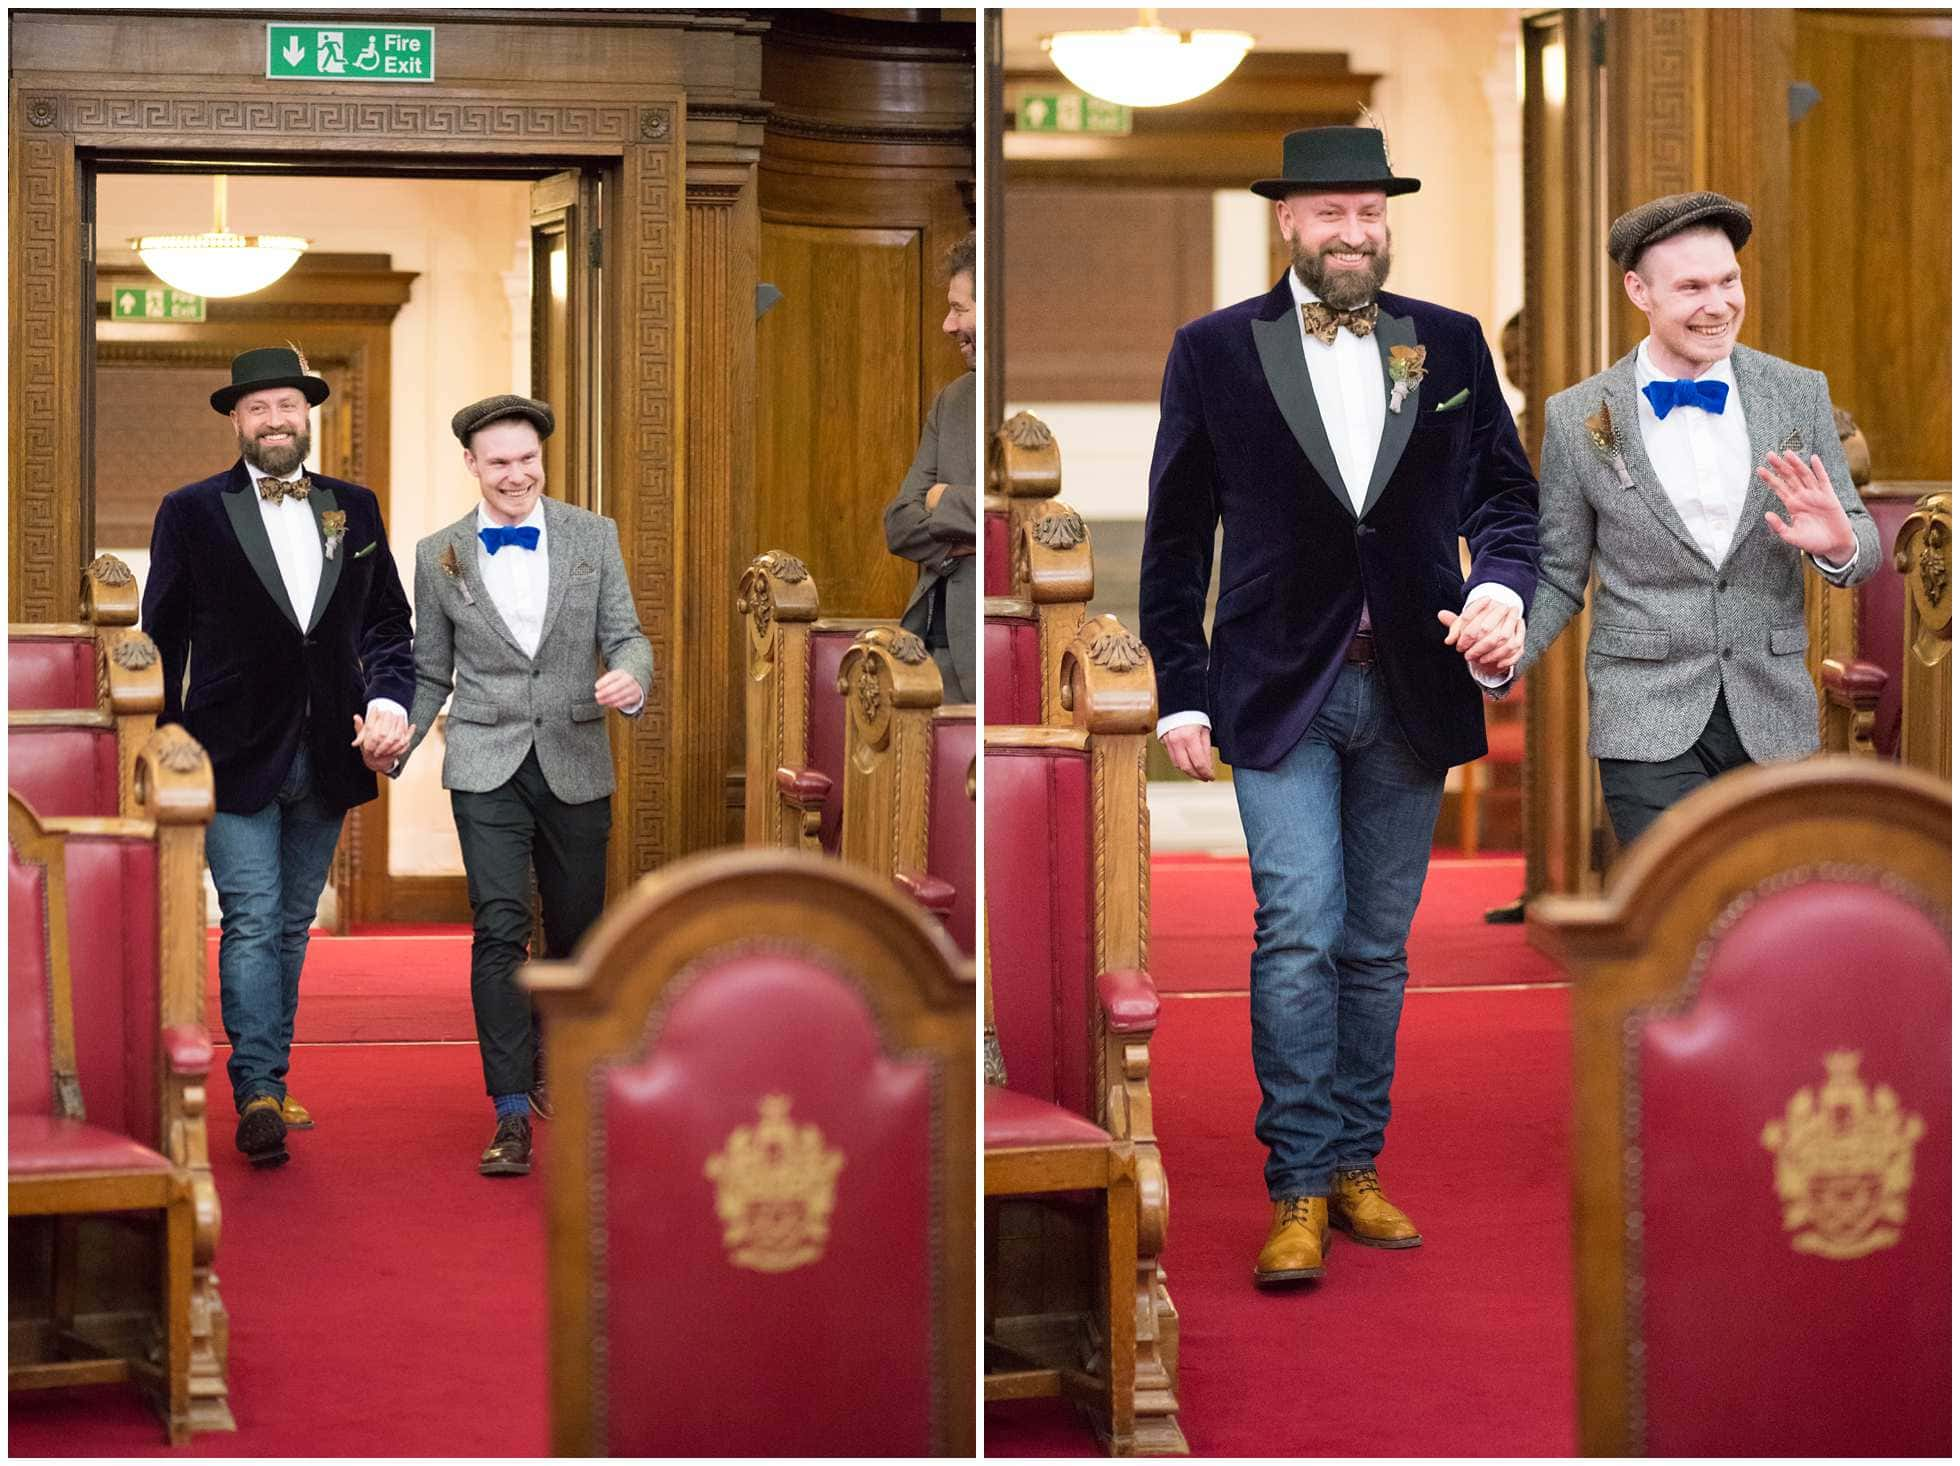 entering the islington town hall wedding room